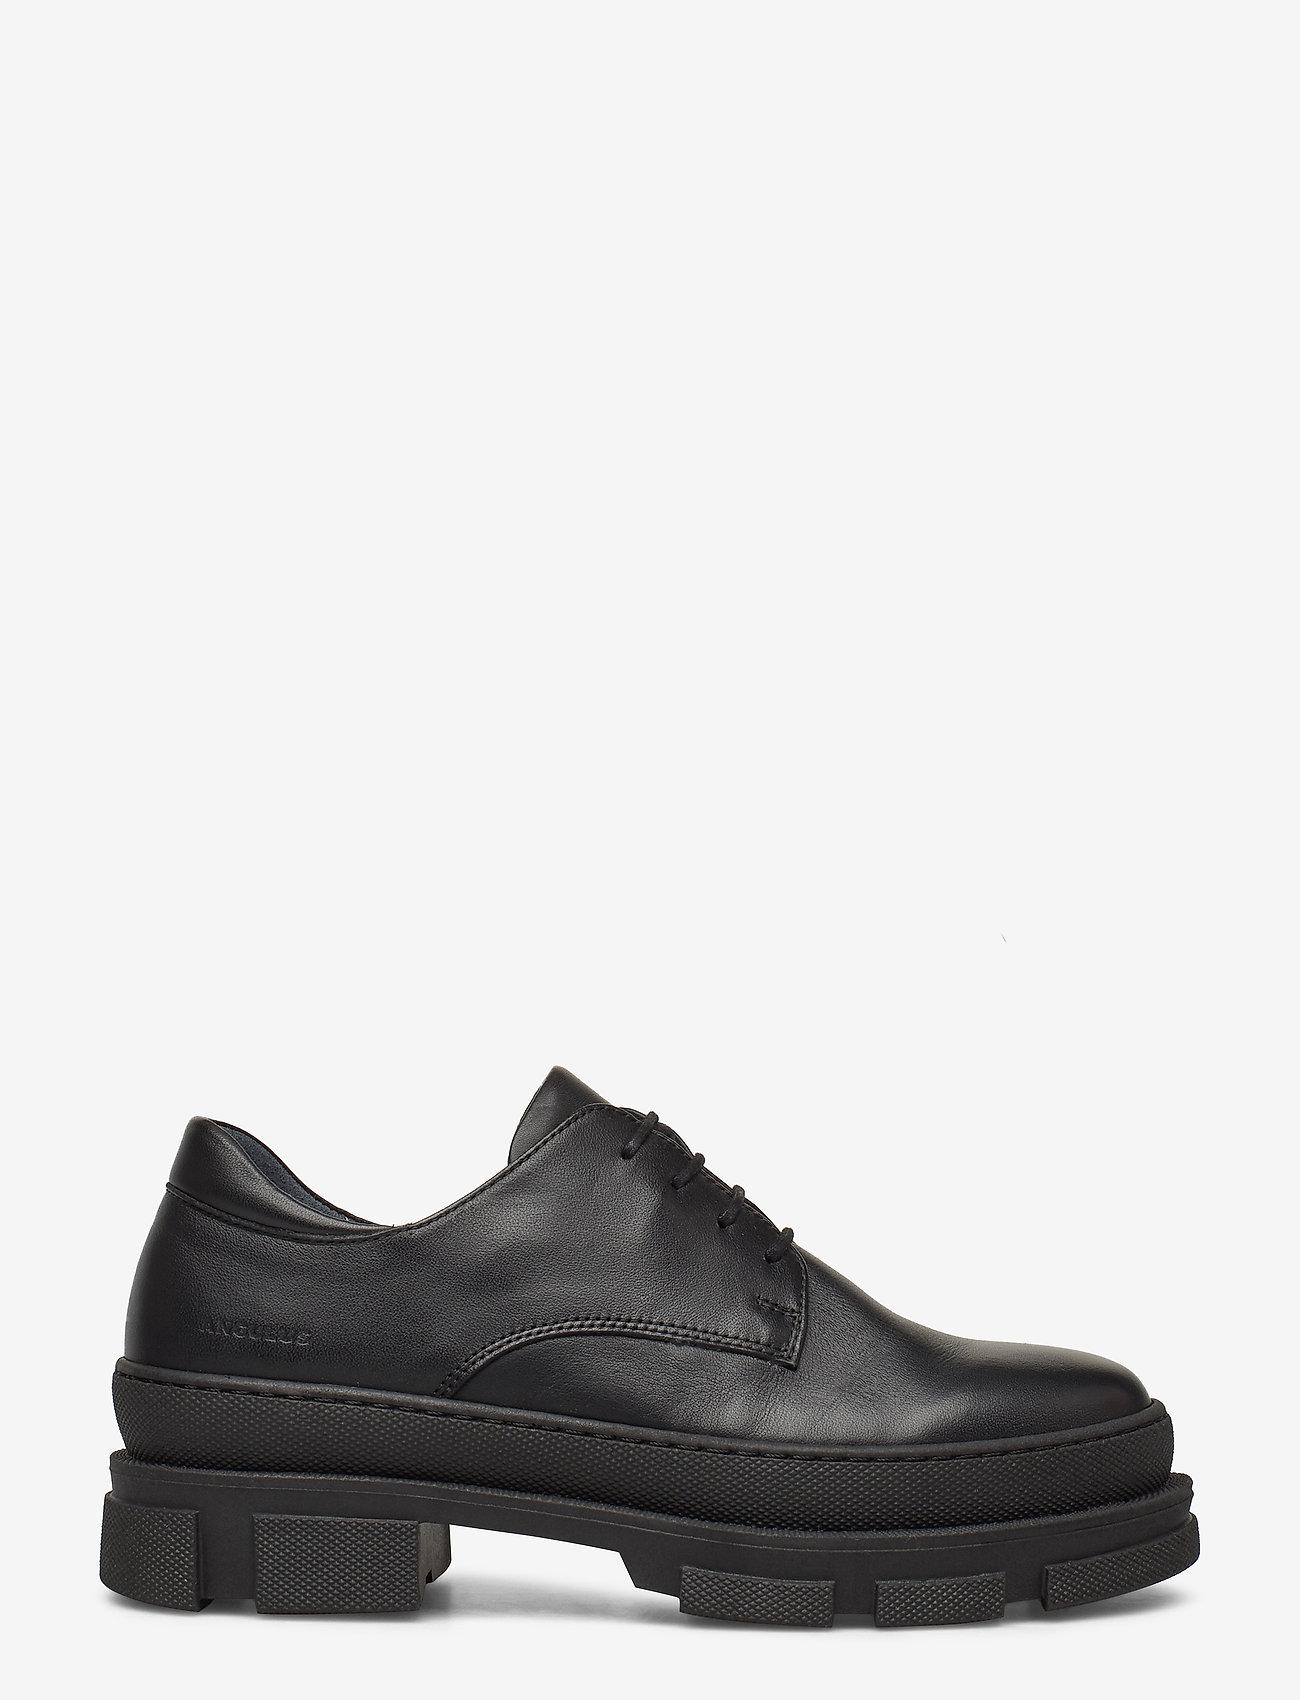 ANGULUS - Shoes - flat - with lace - buty sznurowane - 1604 black - 1